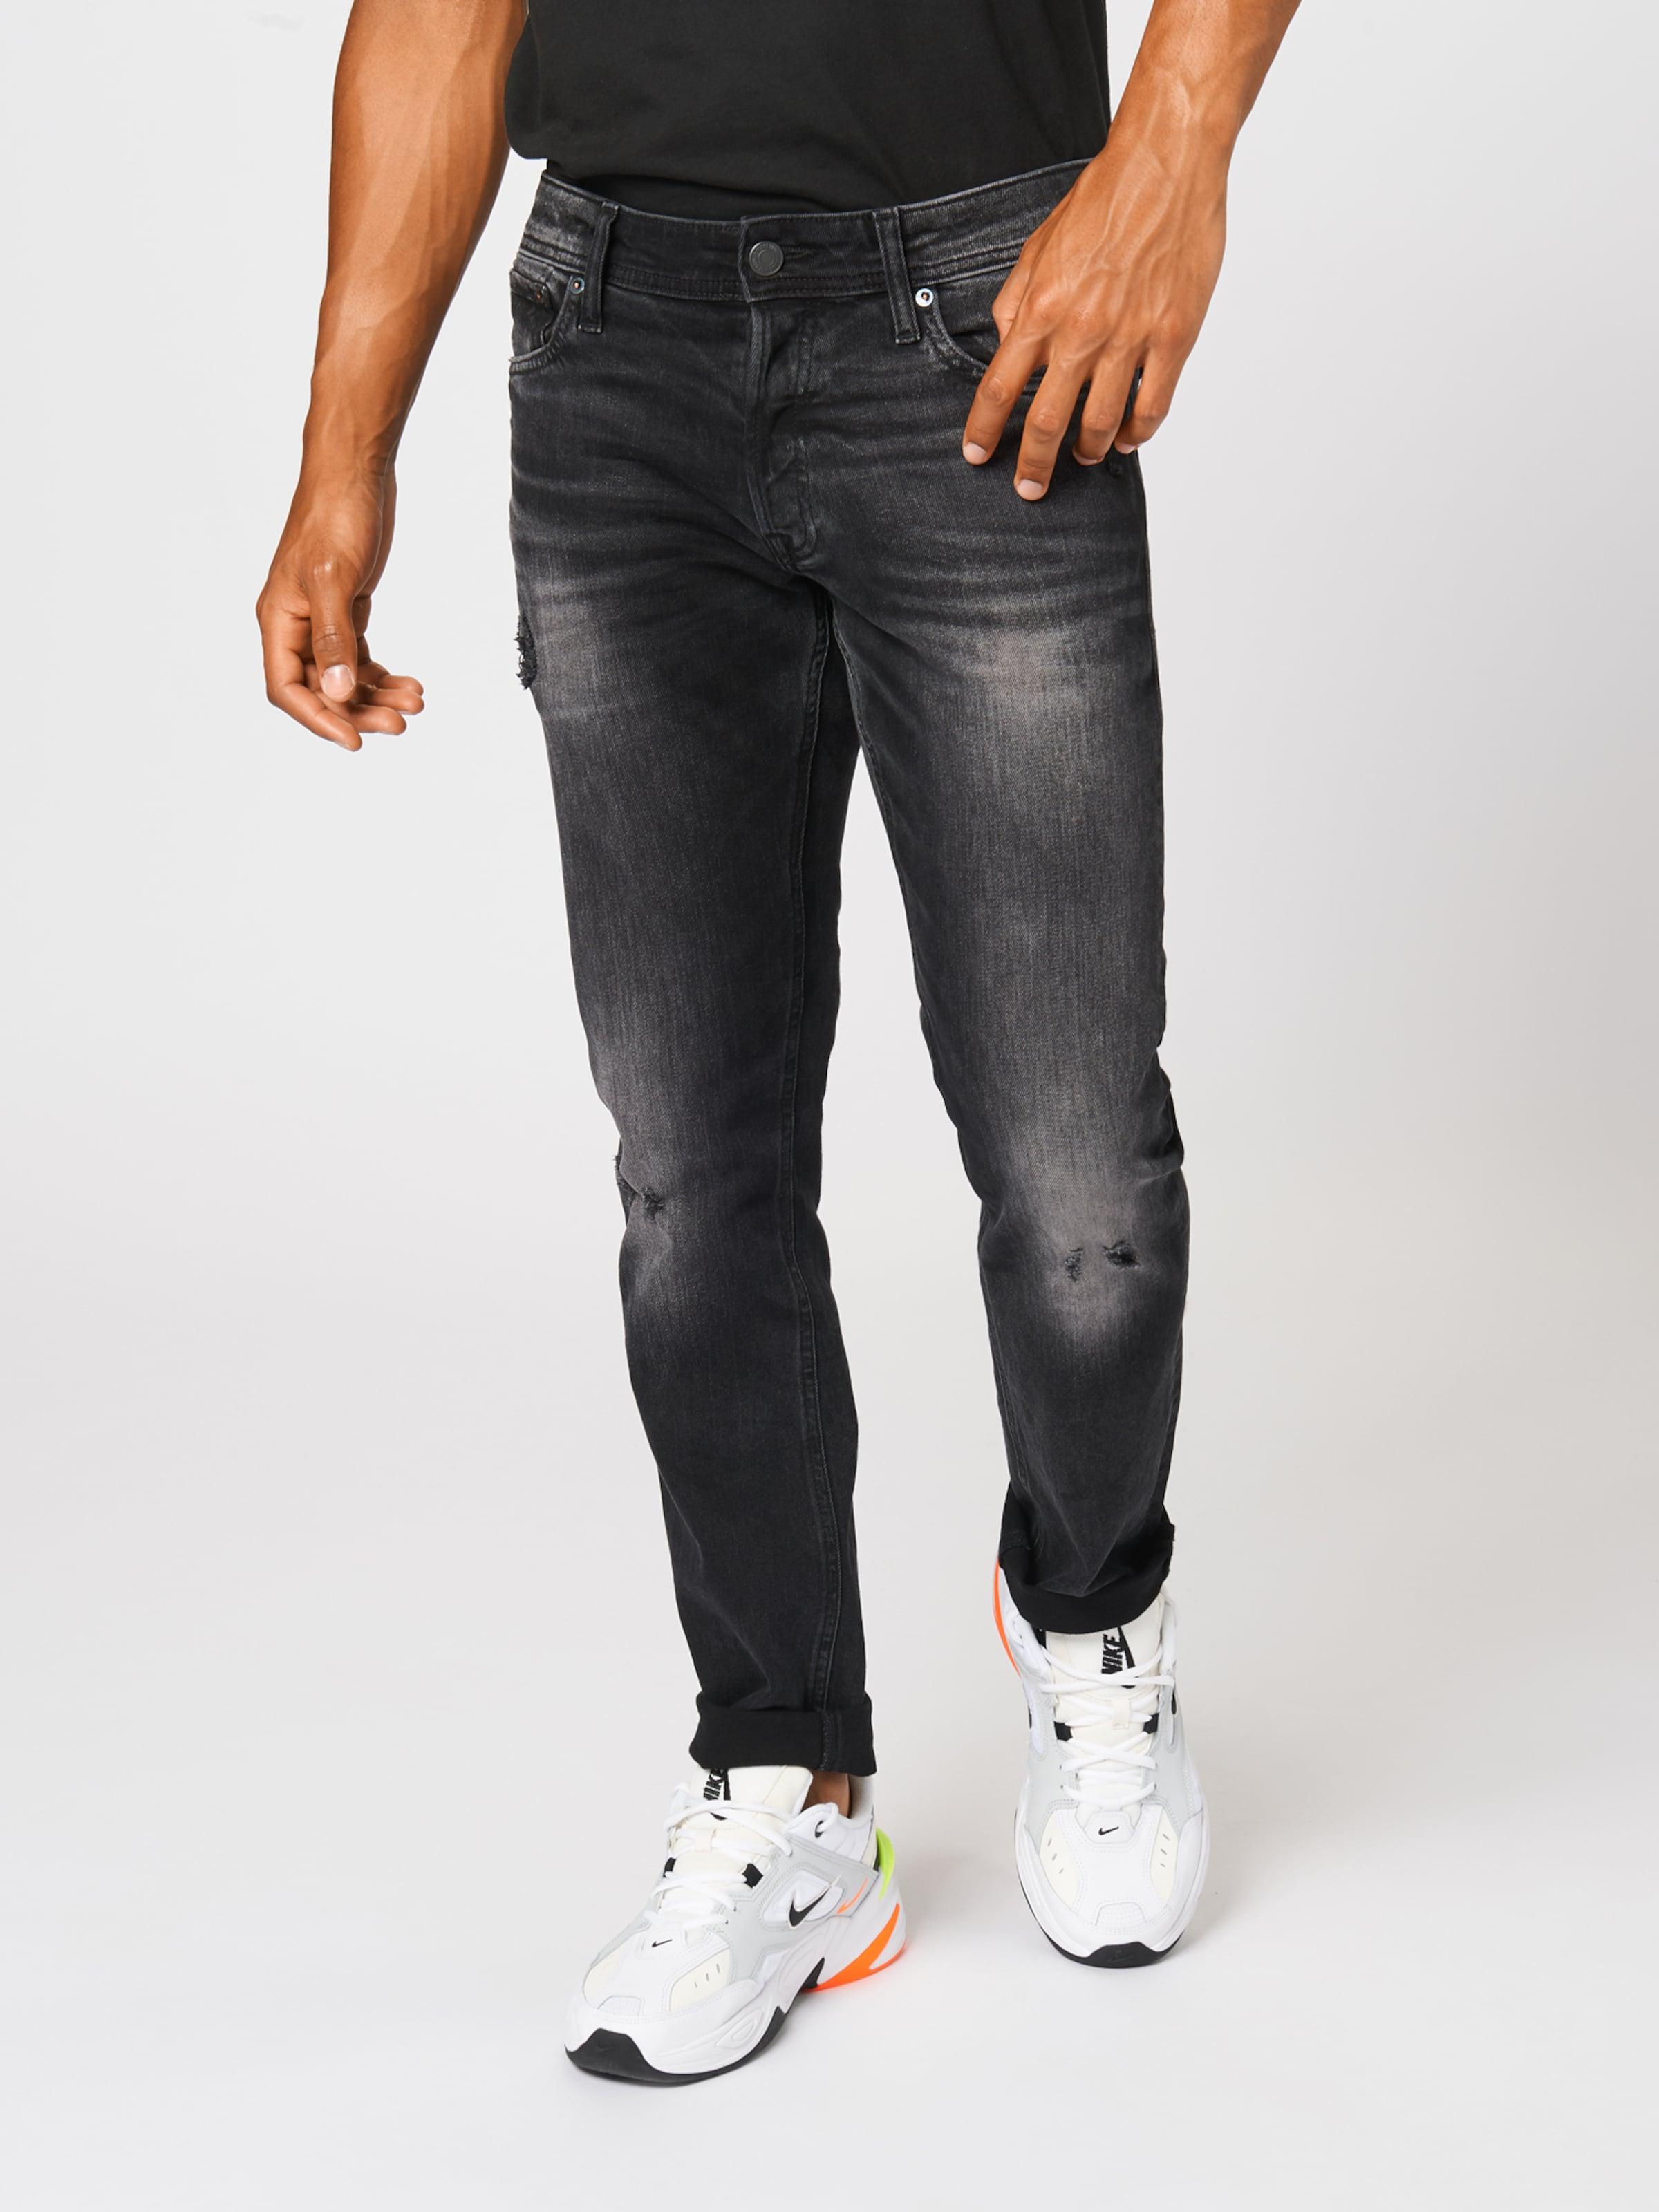 Jeans Denim Jones 'iglenn' Jackamp; In Black tCxBsdQhr